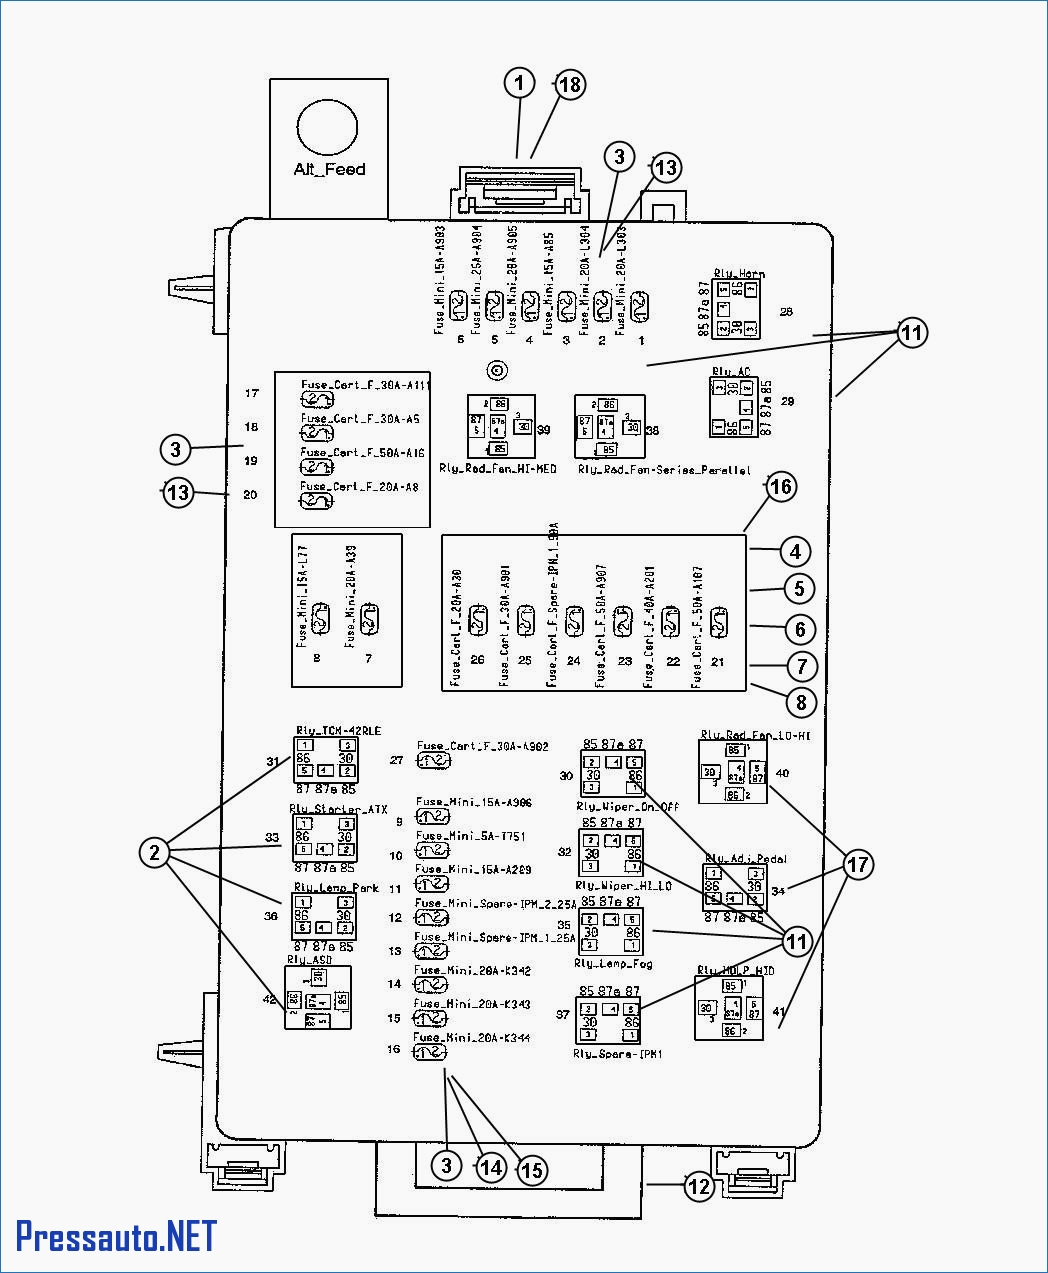 1048x1273 dodge charger fuse box divine design chrysler fuel pump wiring